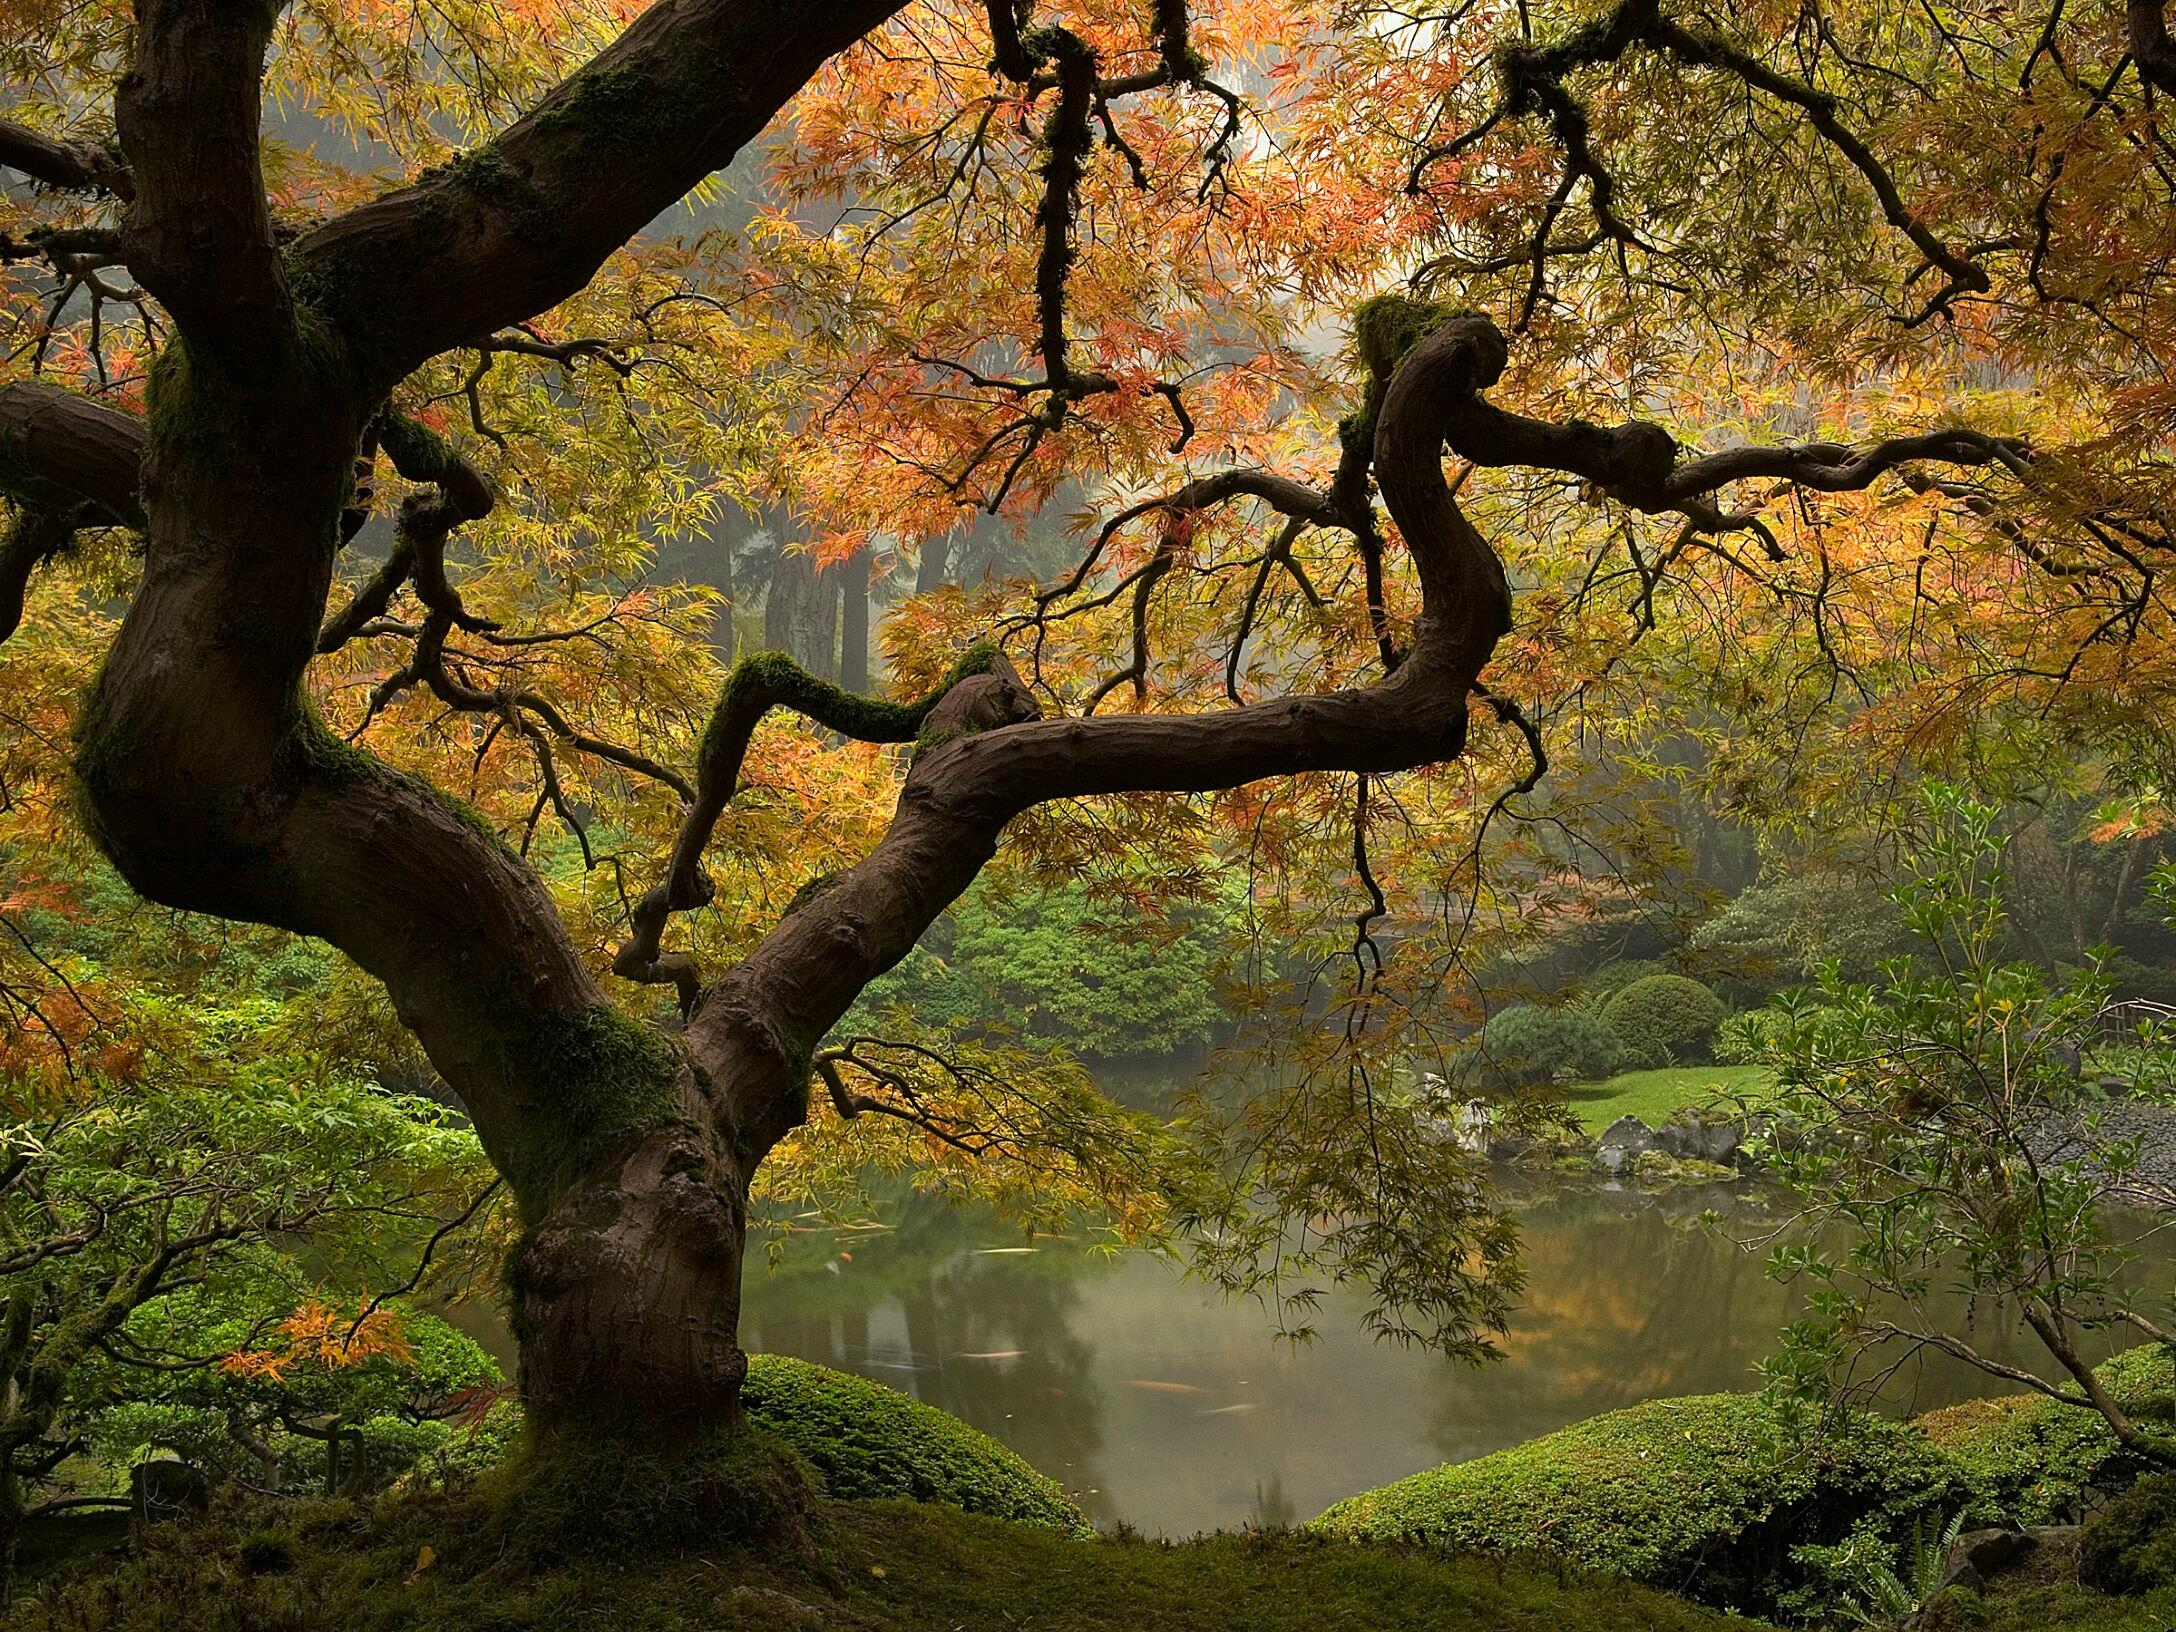 A Japanese Maple tree near a pond